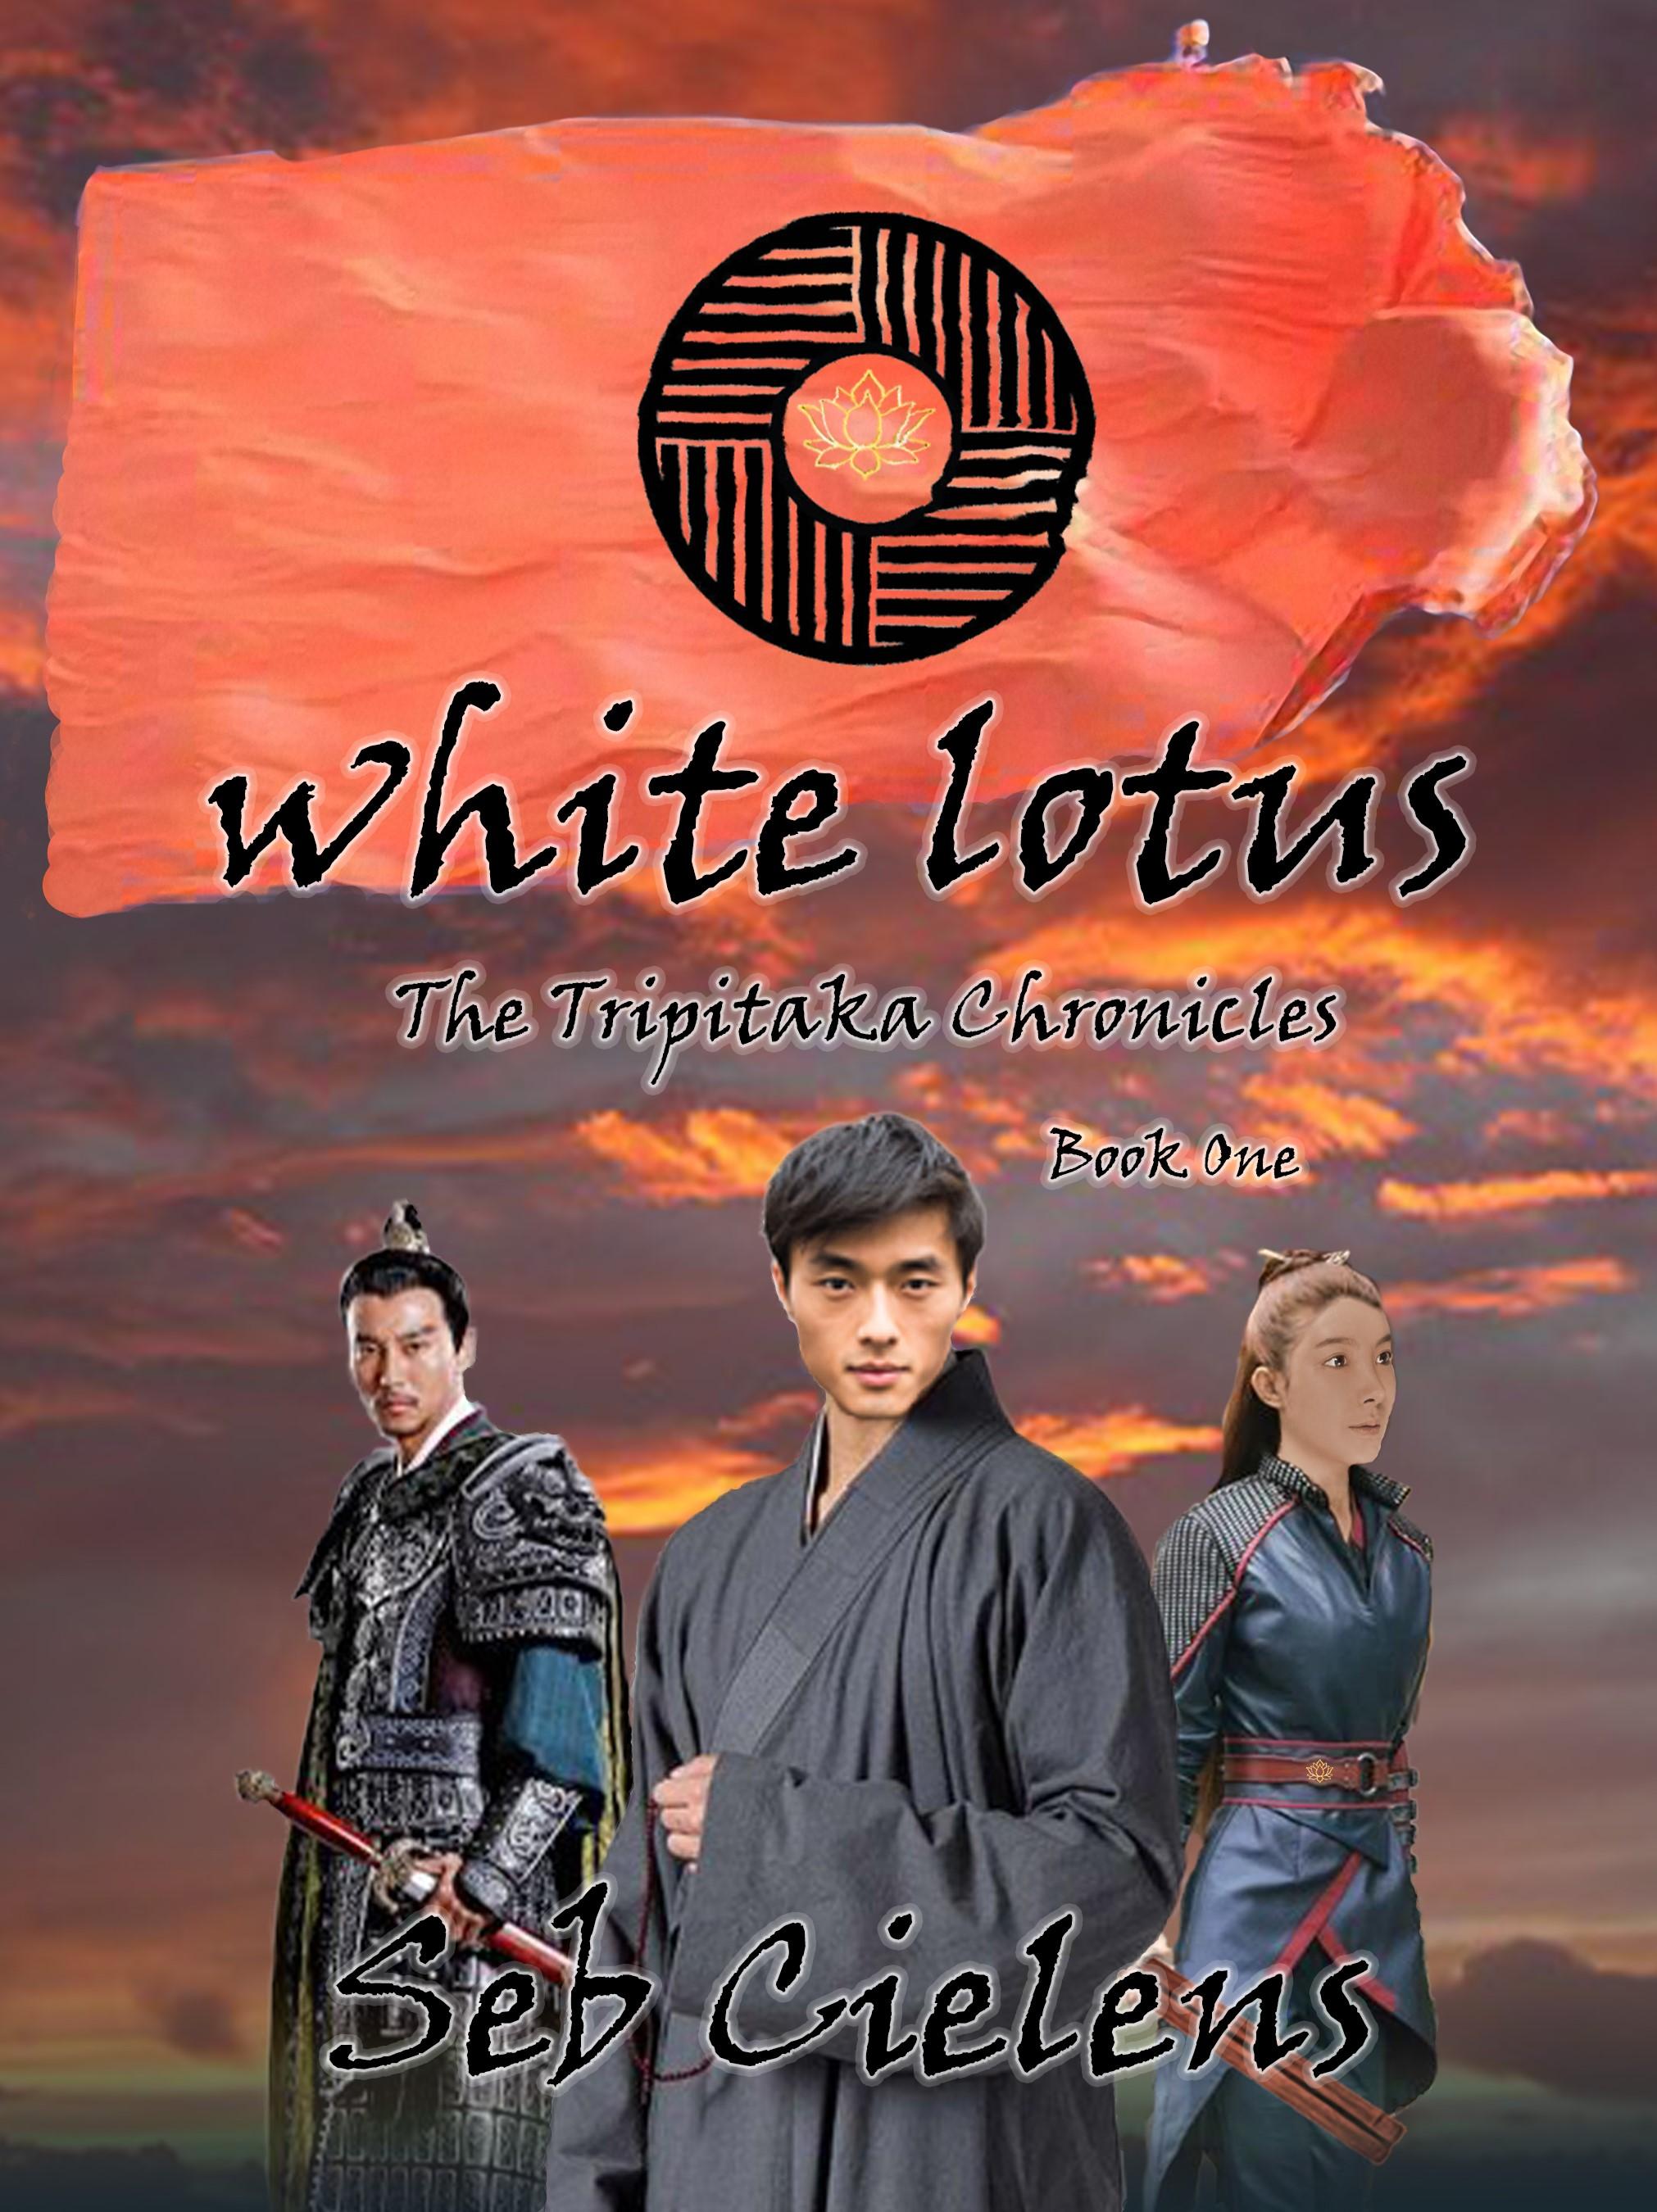 White Lotus cover